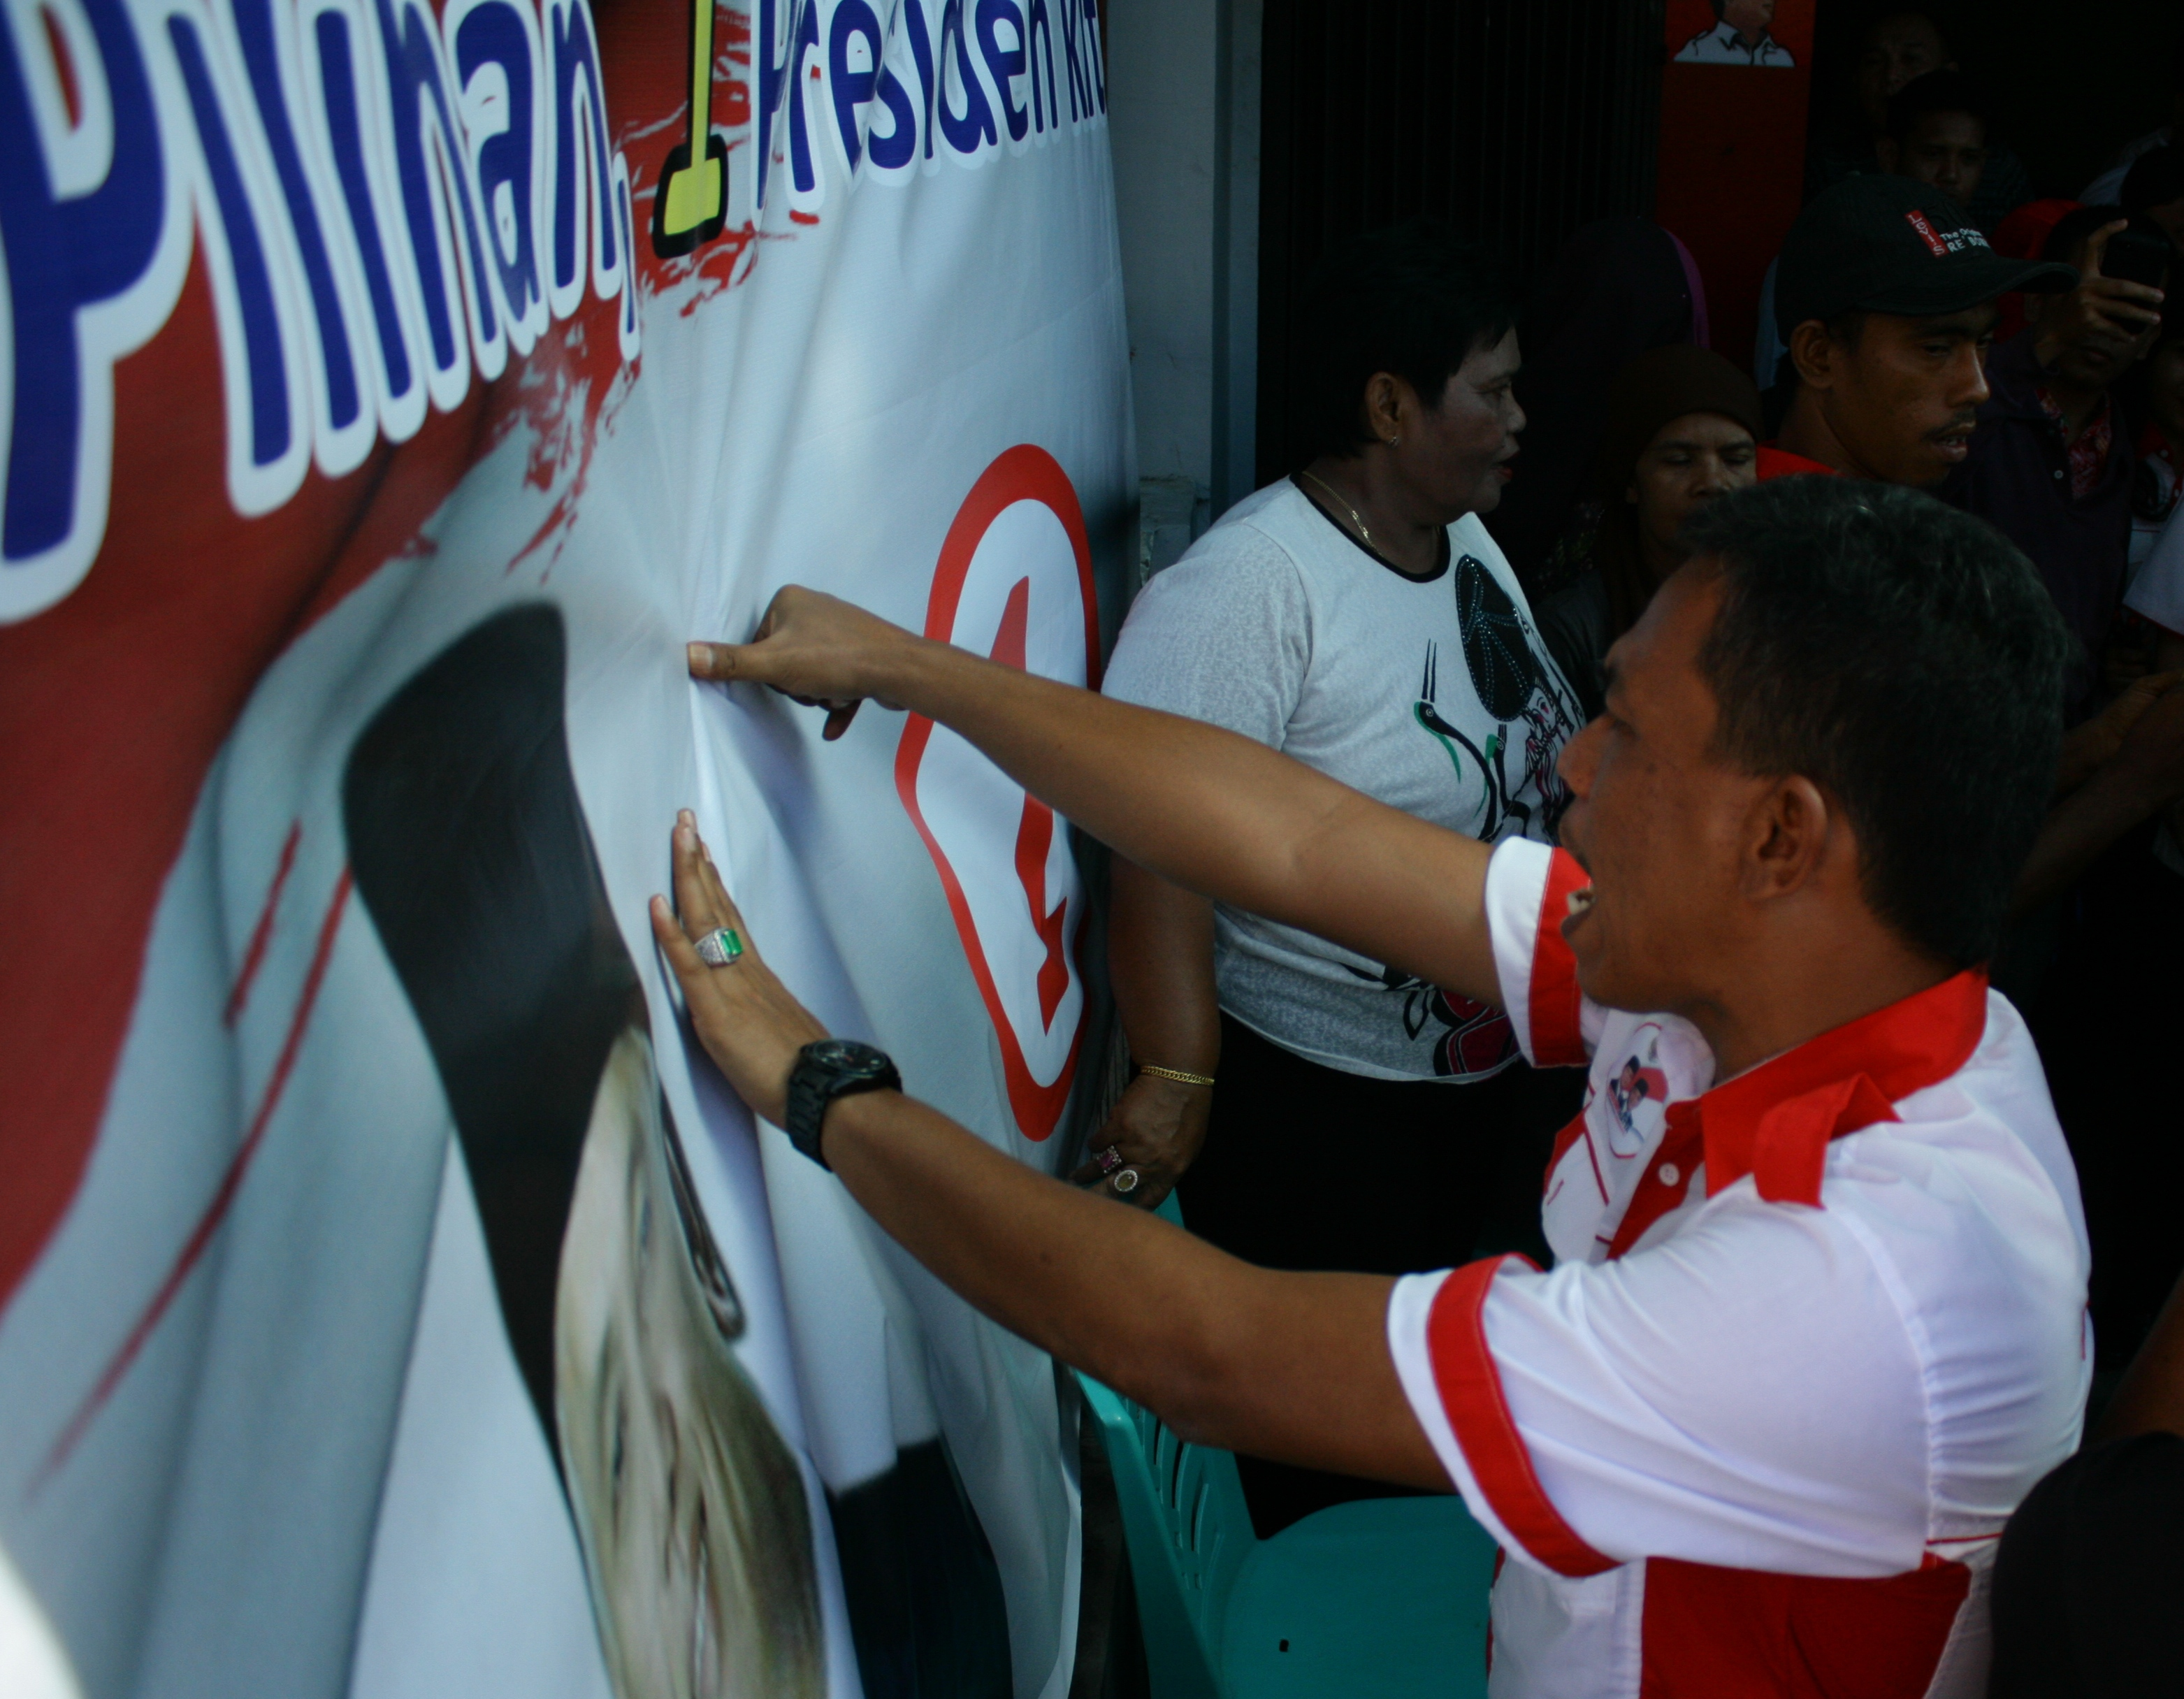 Masyarakat Indonesia (MARI) Sumatera Barat deklarasi dukungan kepada Prabowo-Hatta pada Pilpres, 9 Juli mendatang ditandai dengan cap jari darah pada media spanduk. Foto: Yathada